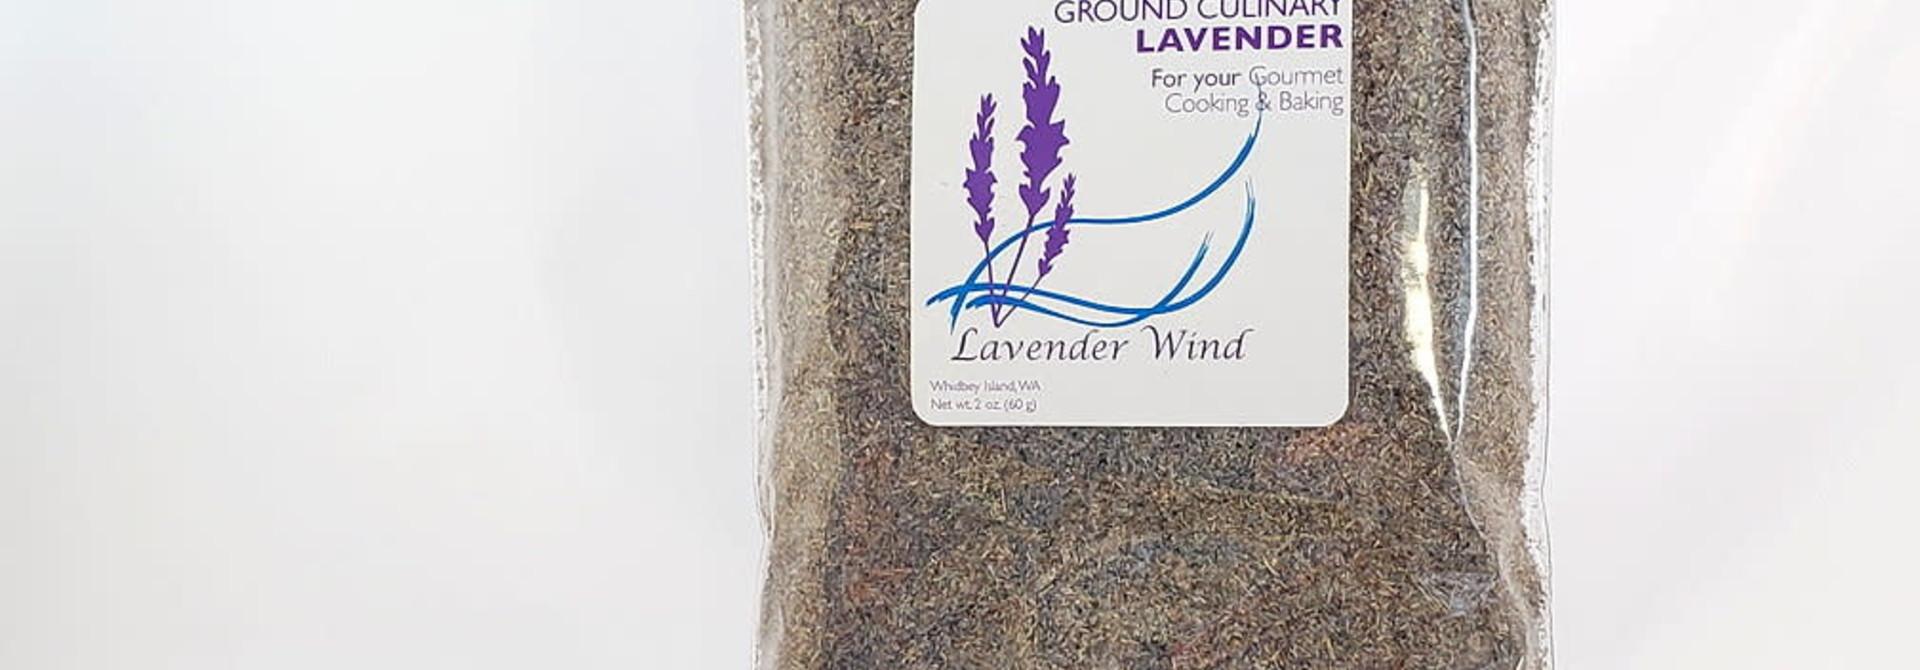 Culinary Lavender, ground 2 oz Refill Bag